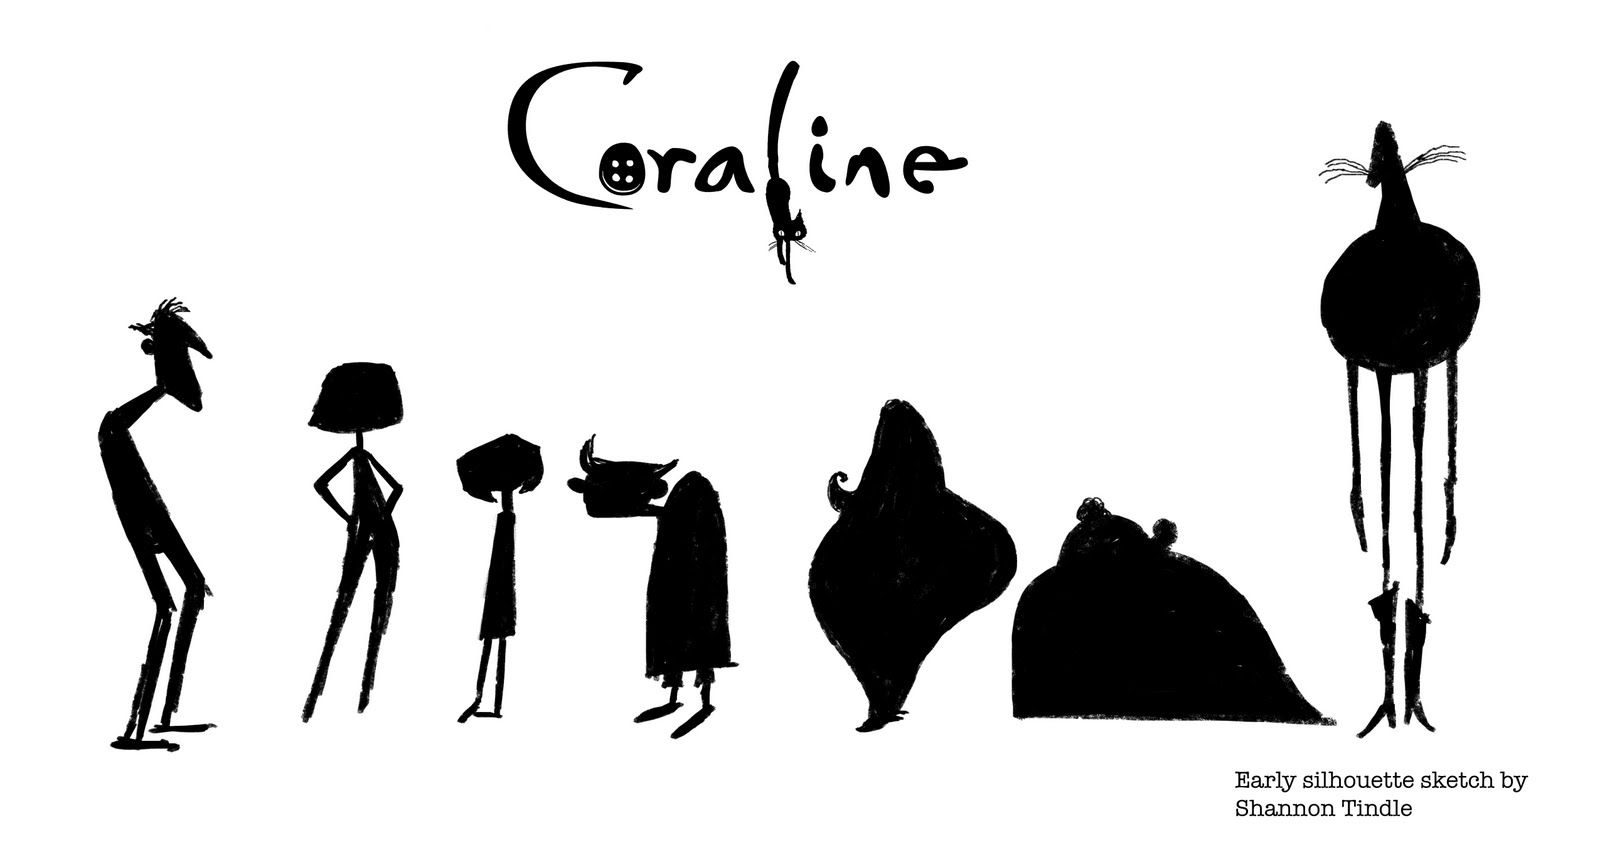 1600x845 Coraline Concept Art Character Design 20093.jpg 3 D